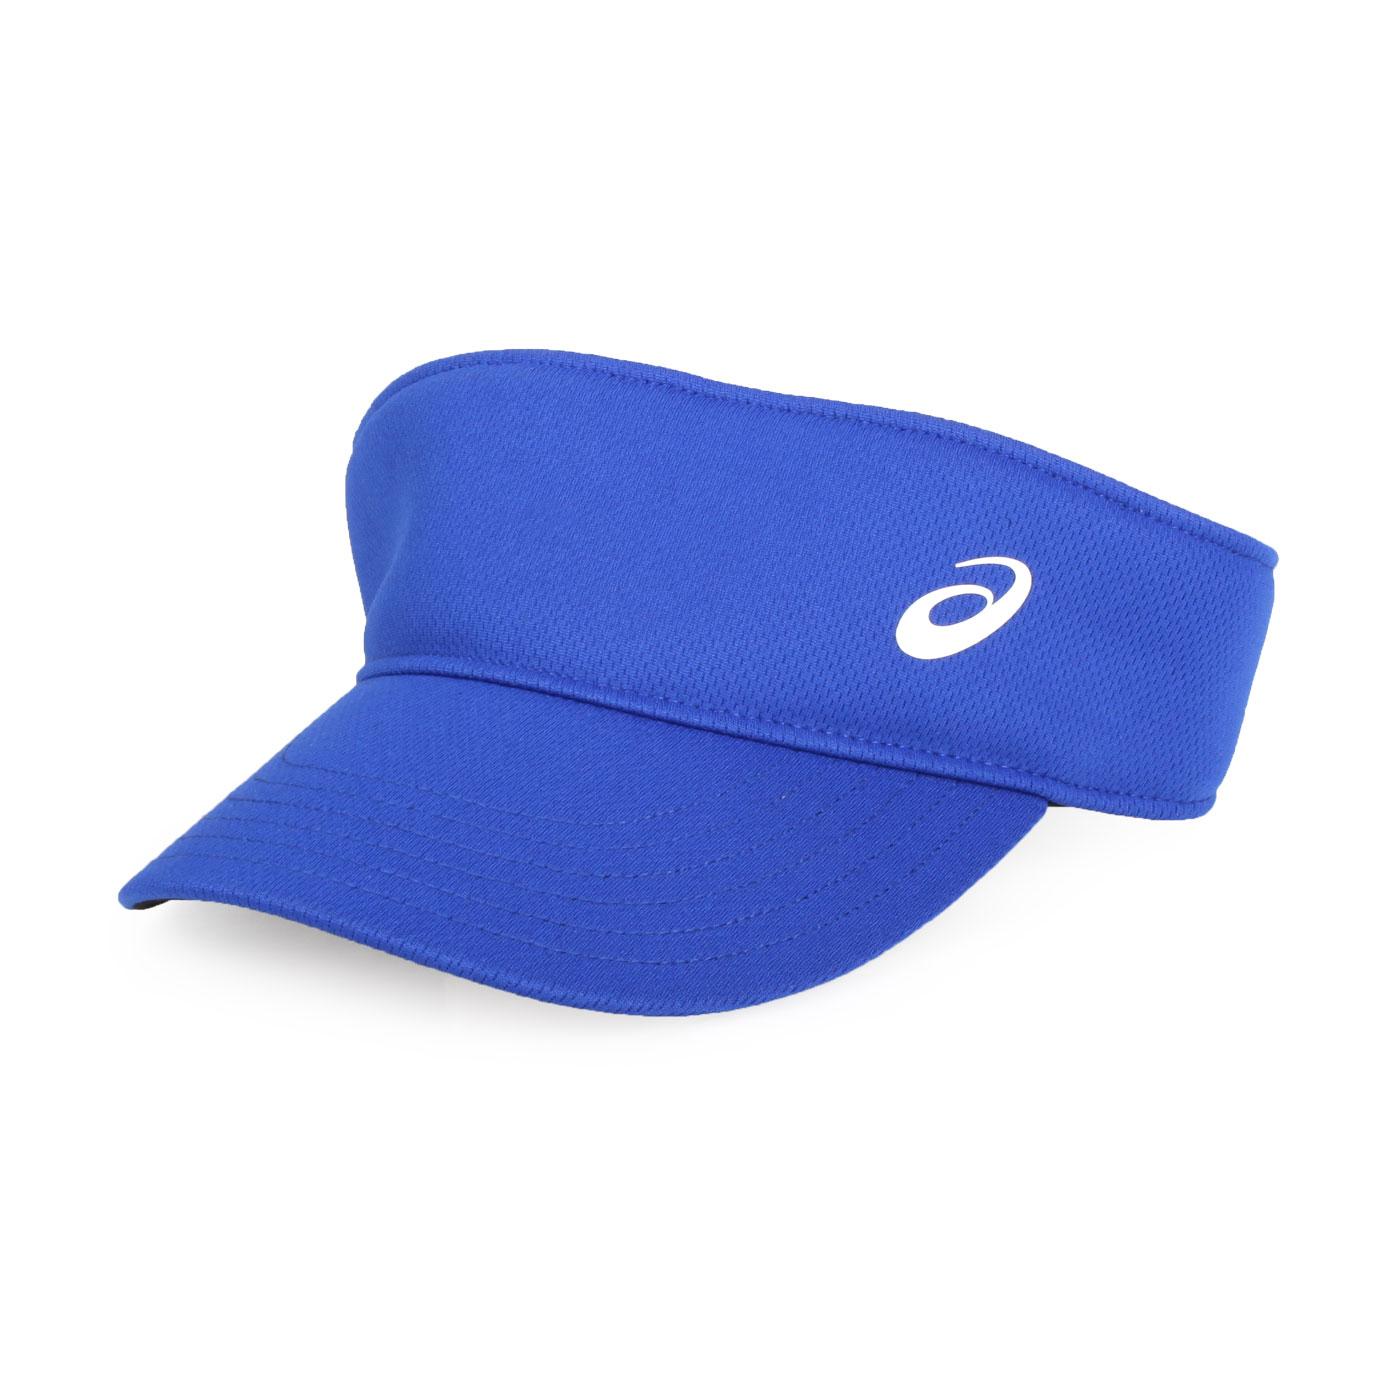 ASICS 運動遮陽帽 155941-001 - 藍白